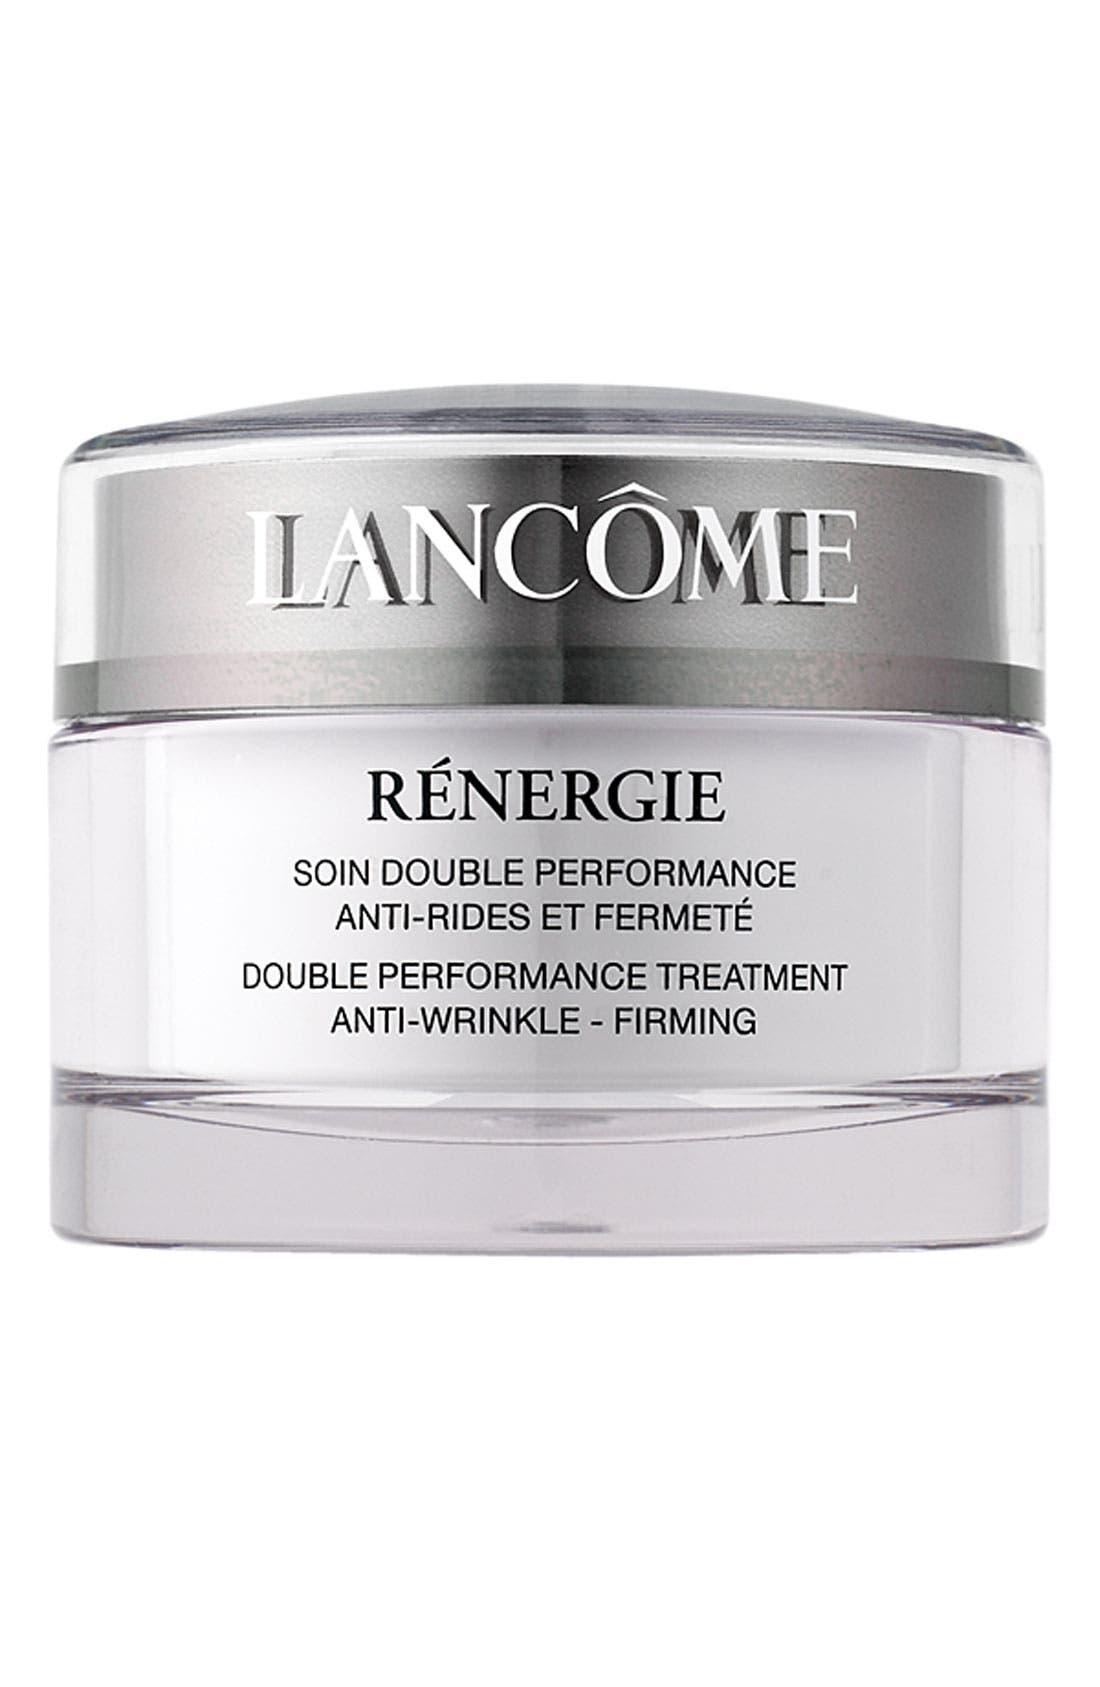 Lancome Renergie Anti-Wrinkle & Firming Moisturizer Cream